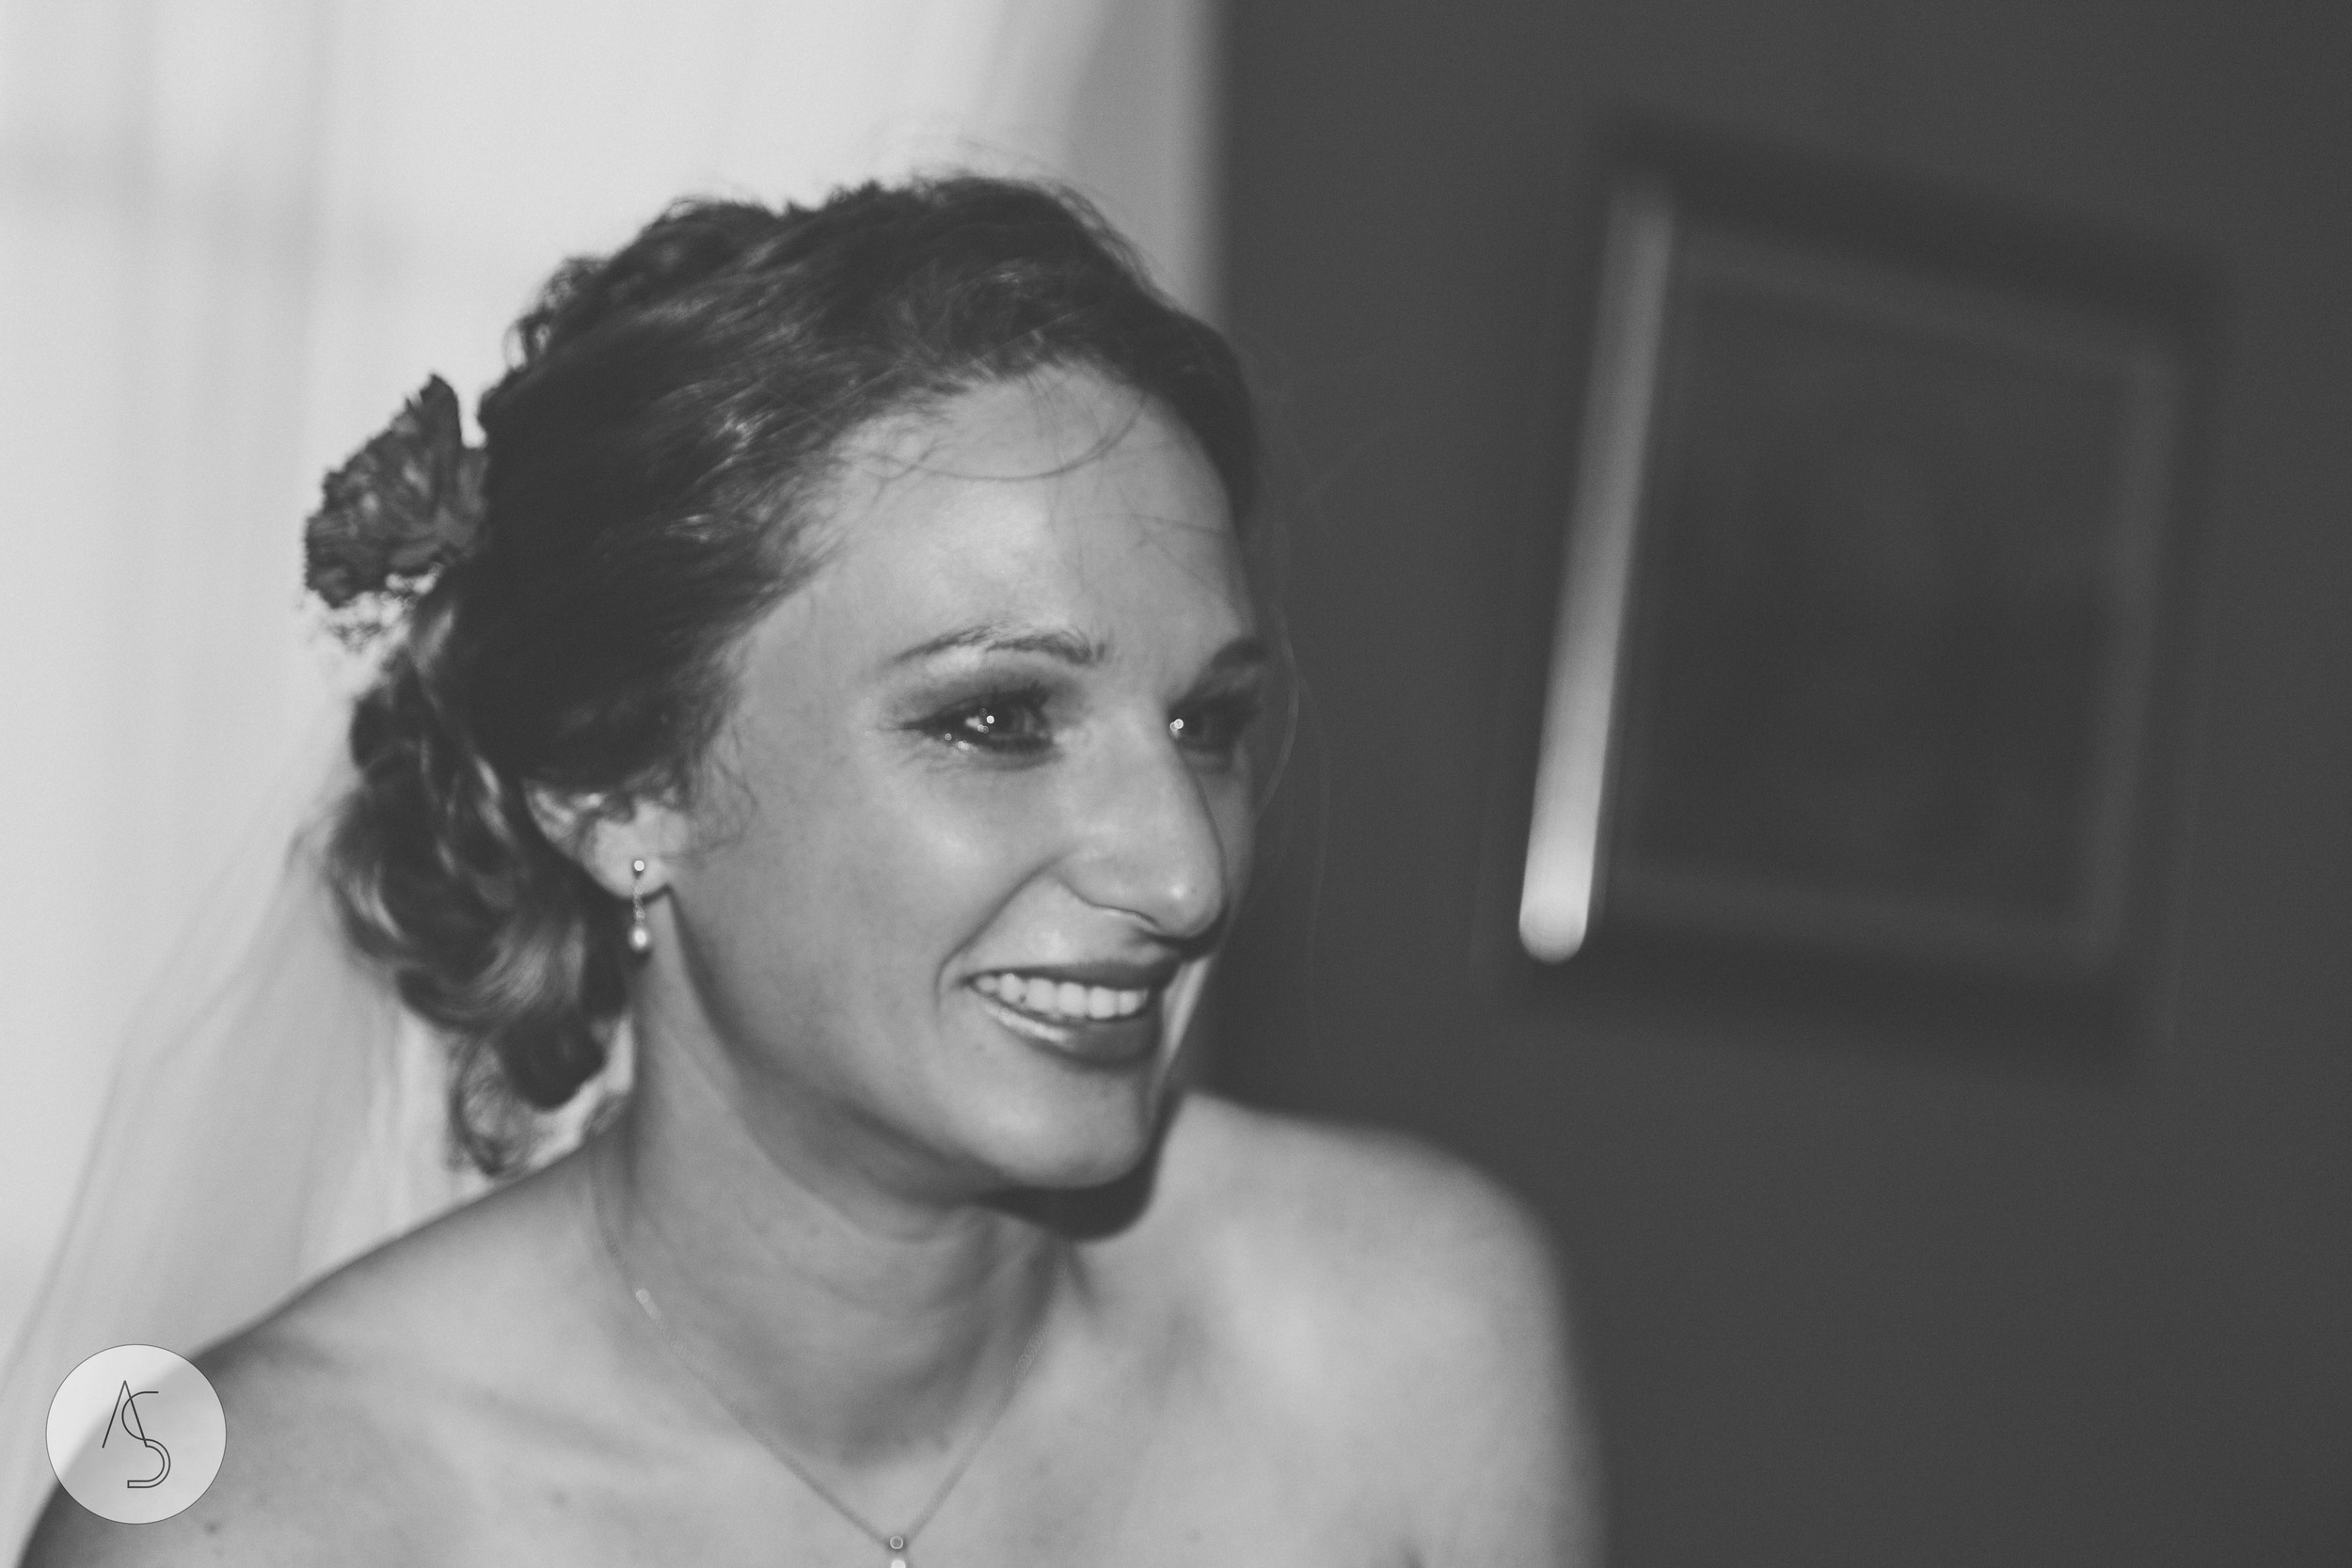 photographe mariage - Grenoble - Rhone Alpes - Adriana Salazar photo-76.jpg